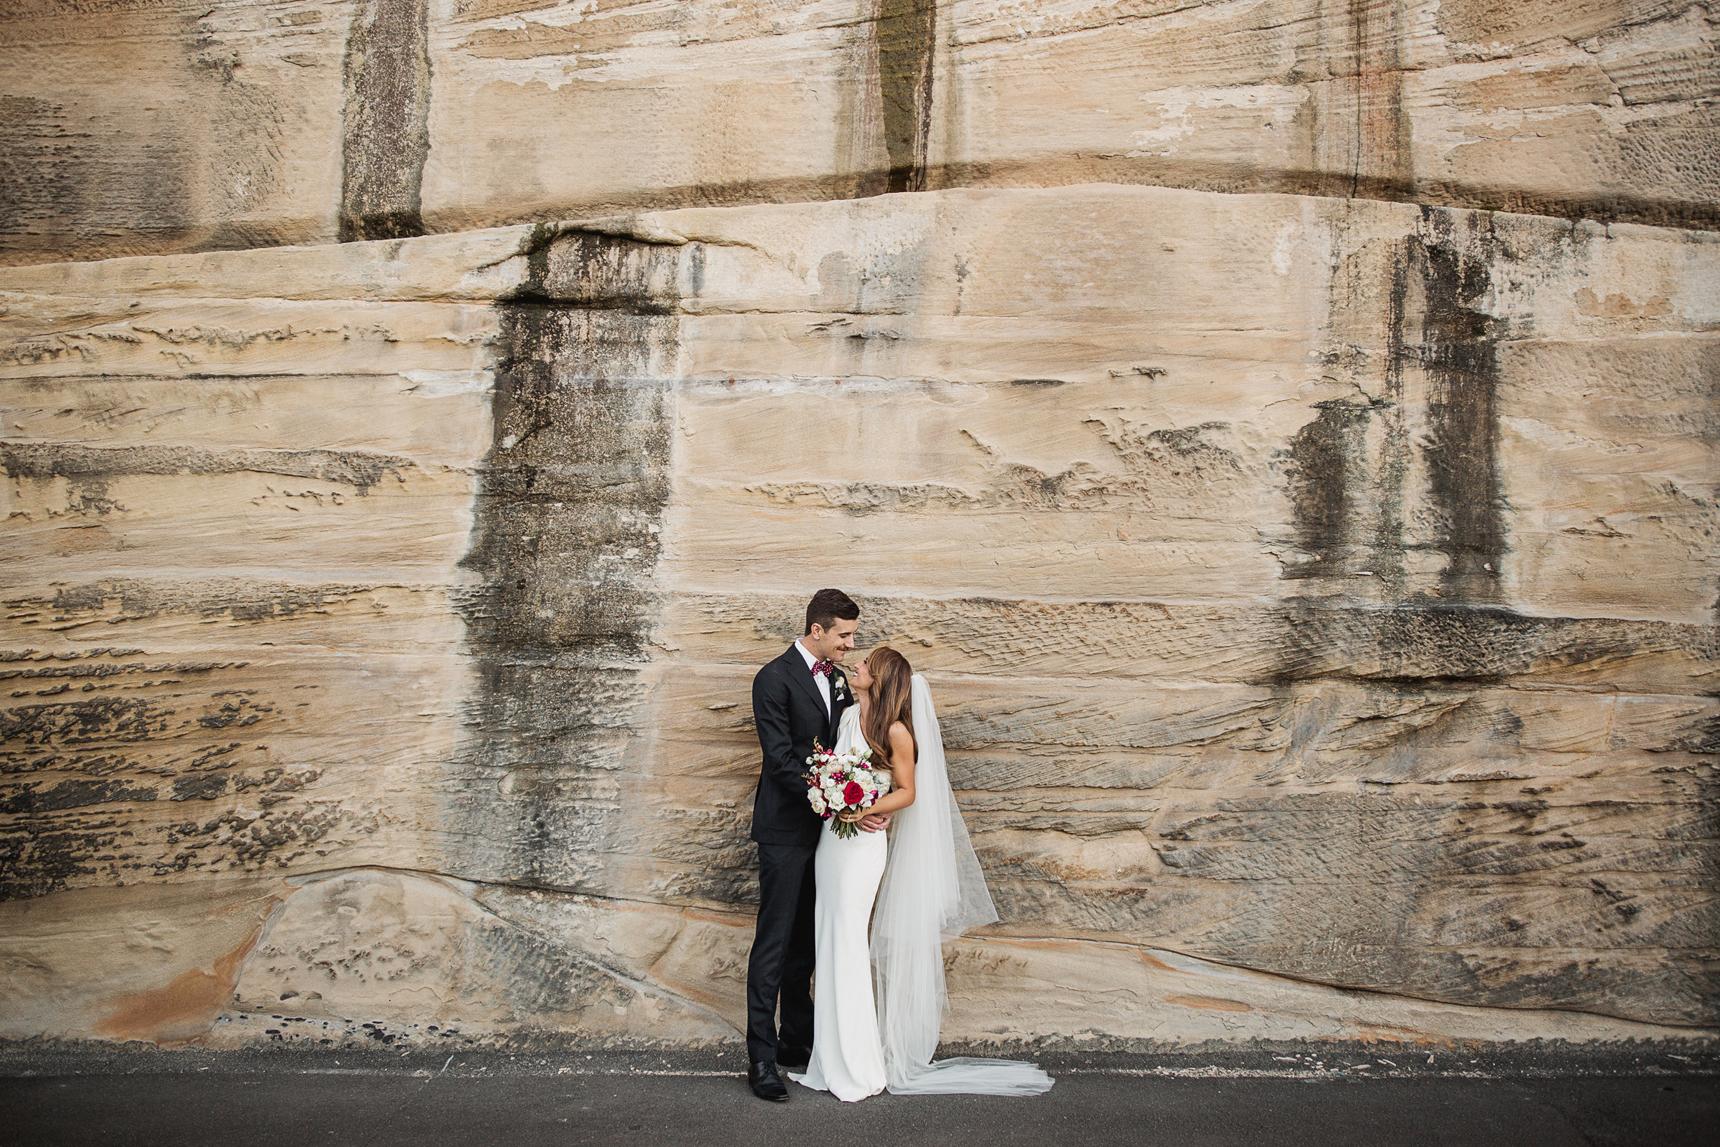 GregLana_ViewBySydney_WeddingPhotography050.jpg